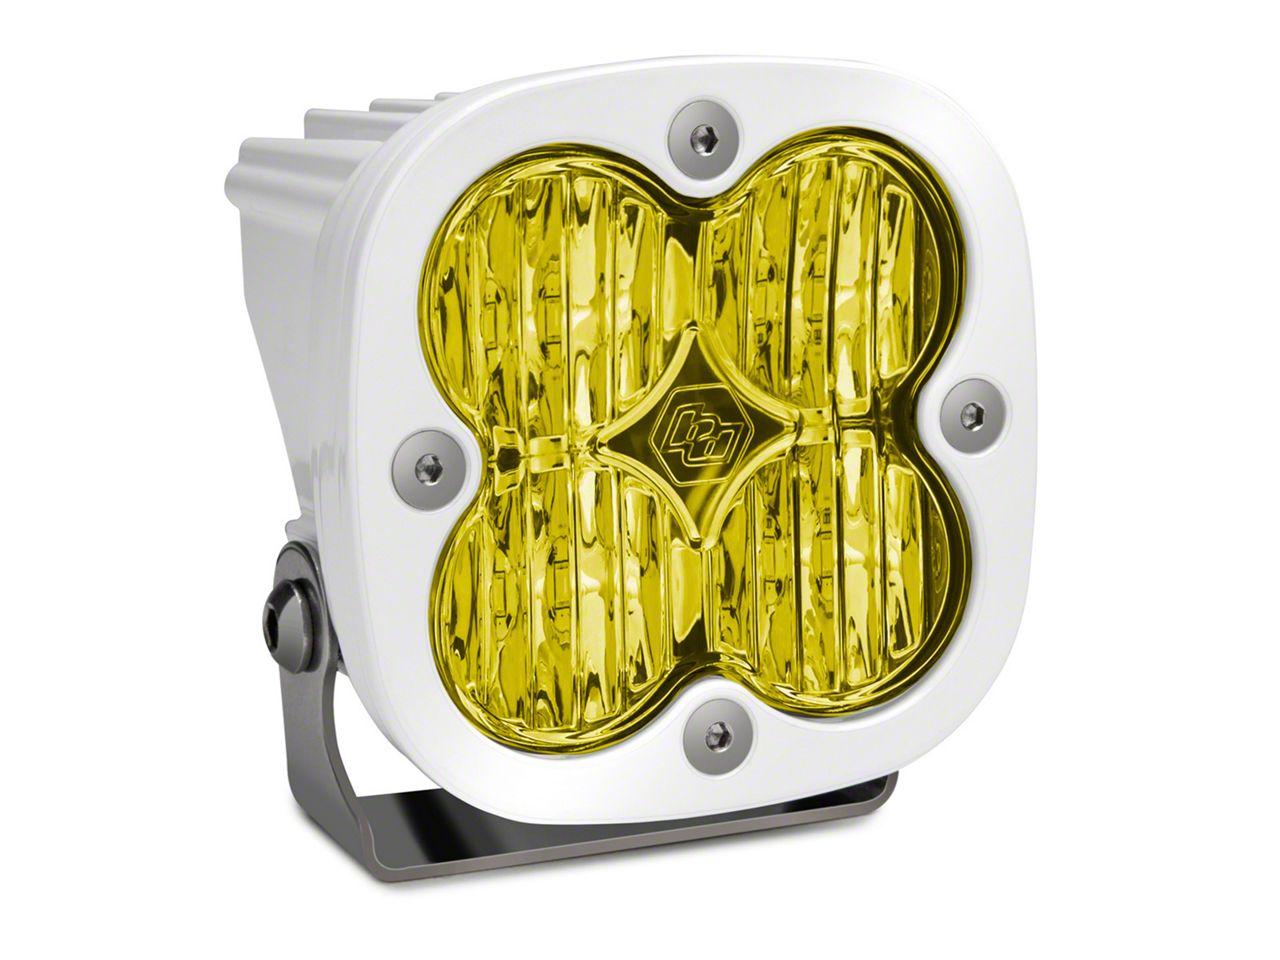 Baja Designs Squadron Sport Amber/White LED Light - Wide Cornering Beam